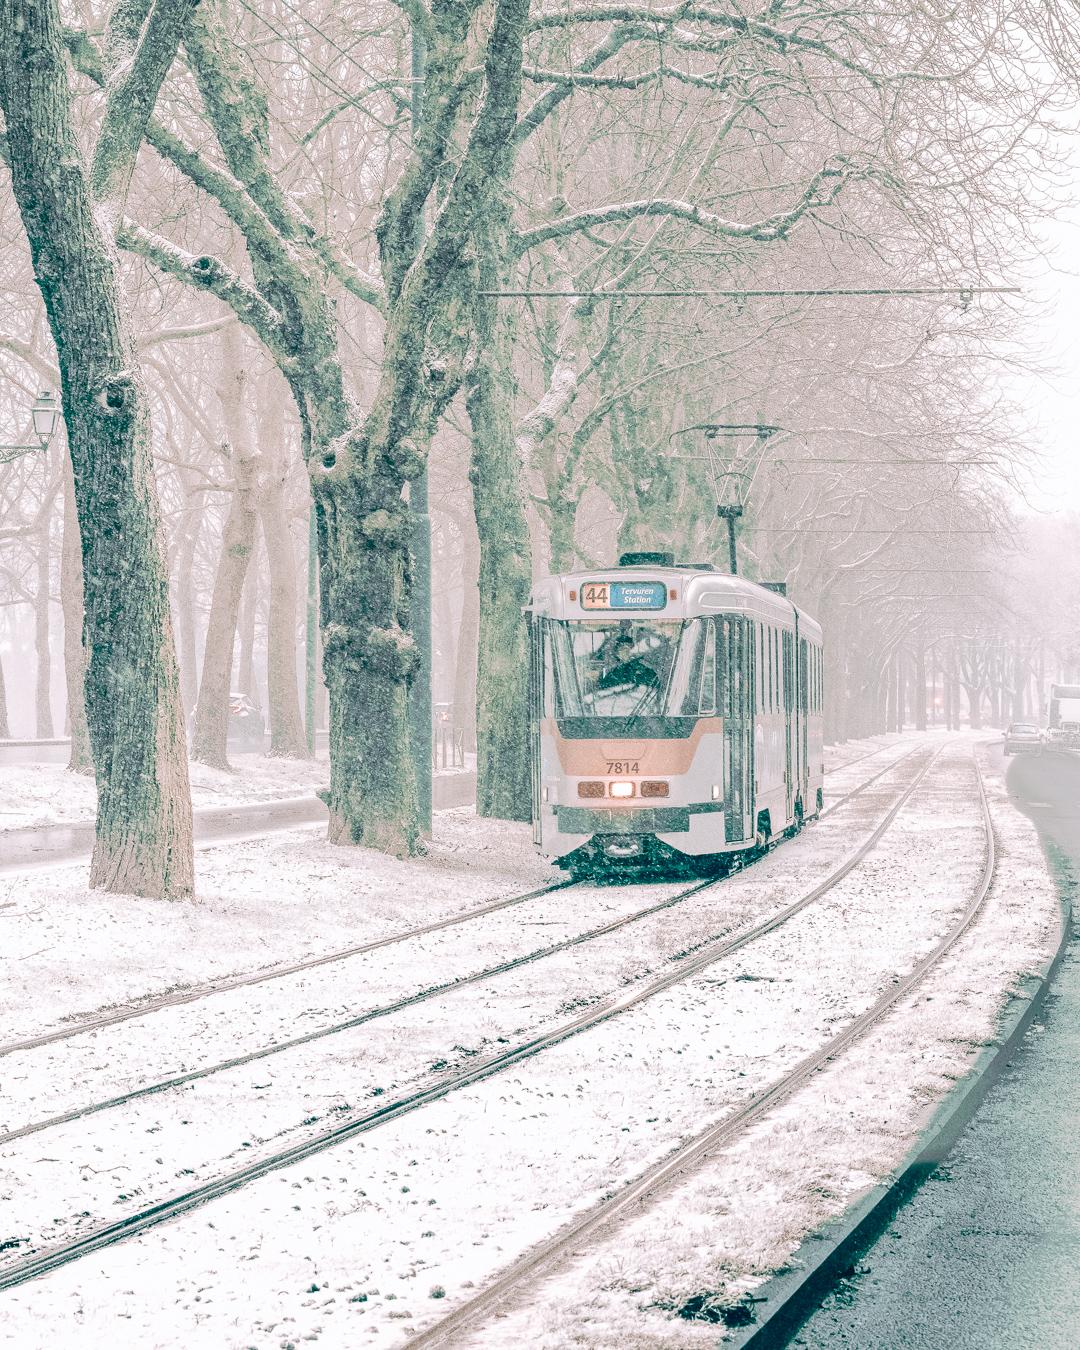 A tram in Belgium in winter